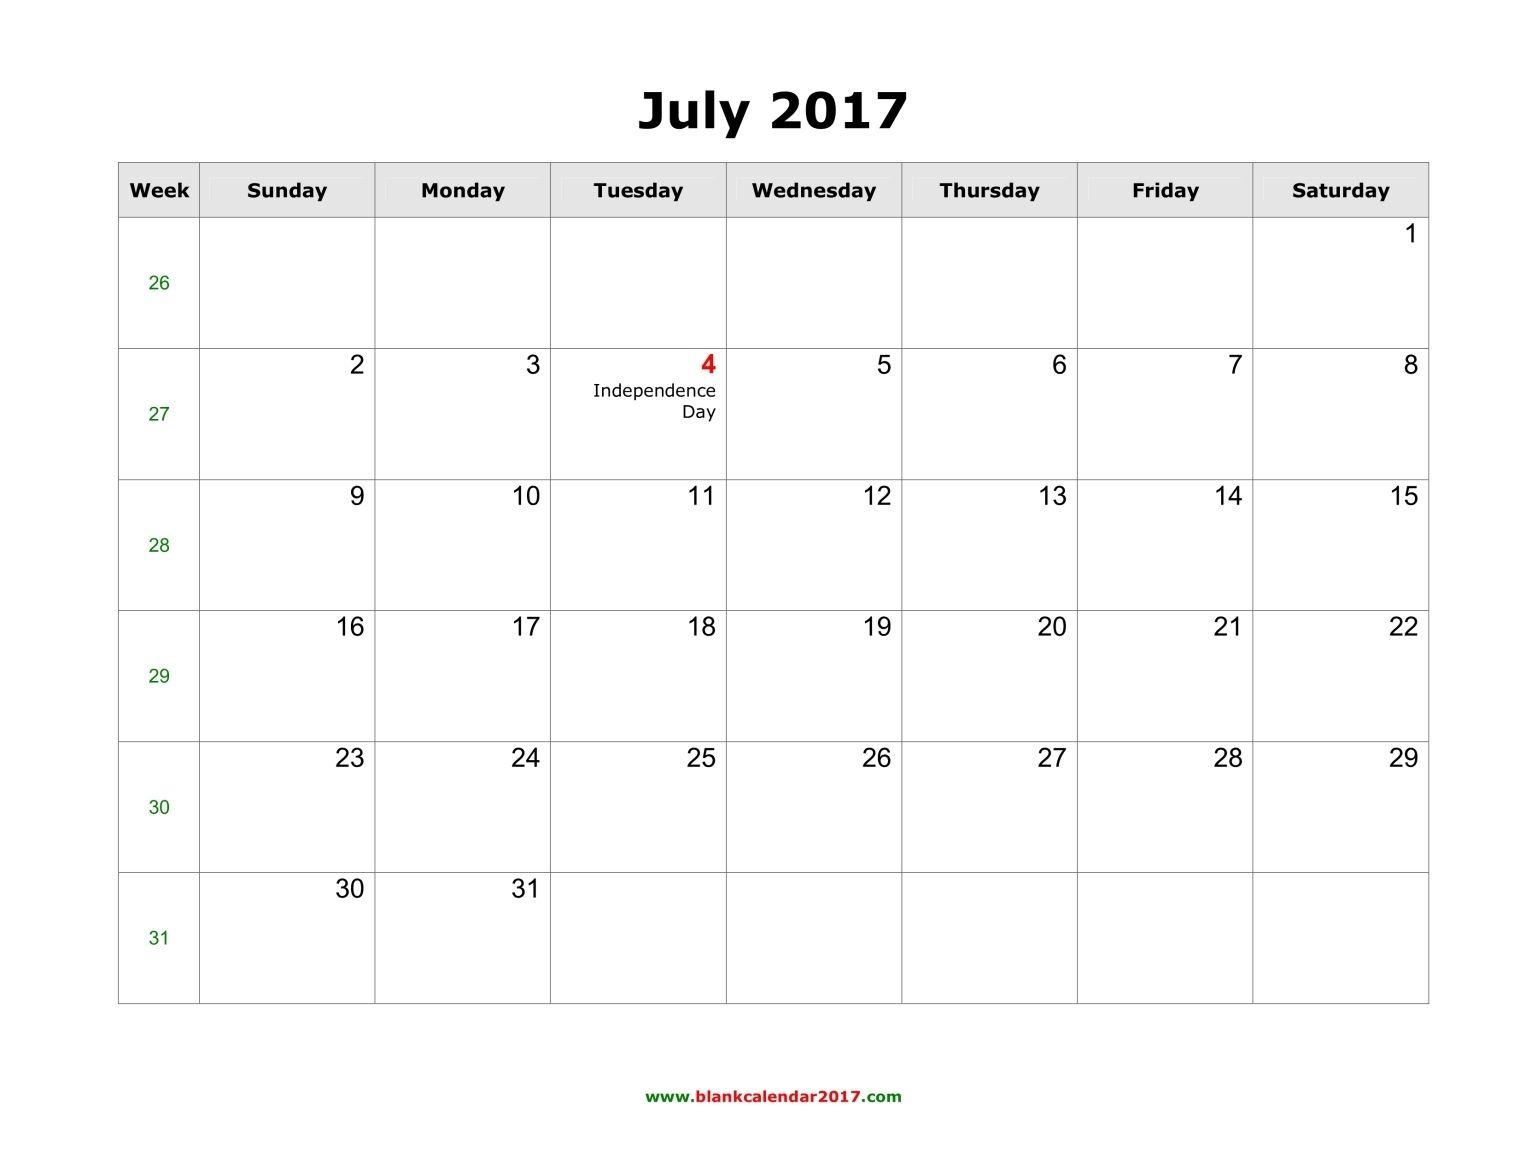 July 2017 Calendarsocialebuzzjuly2017calendar – Remittance Advice Template